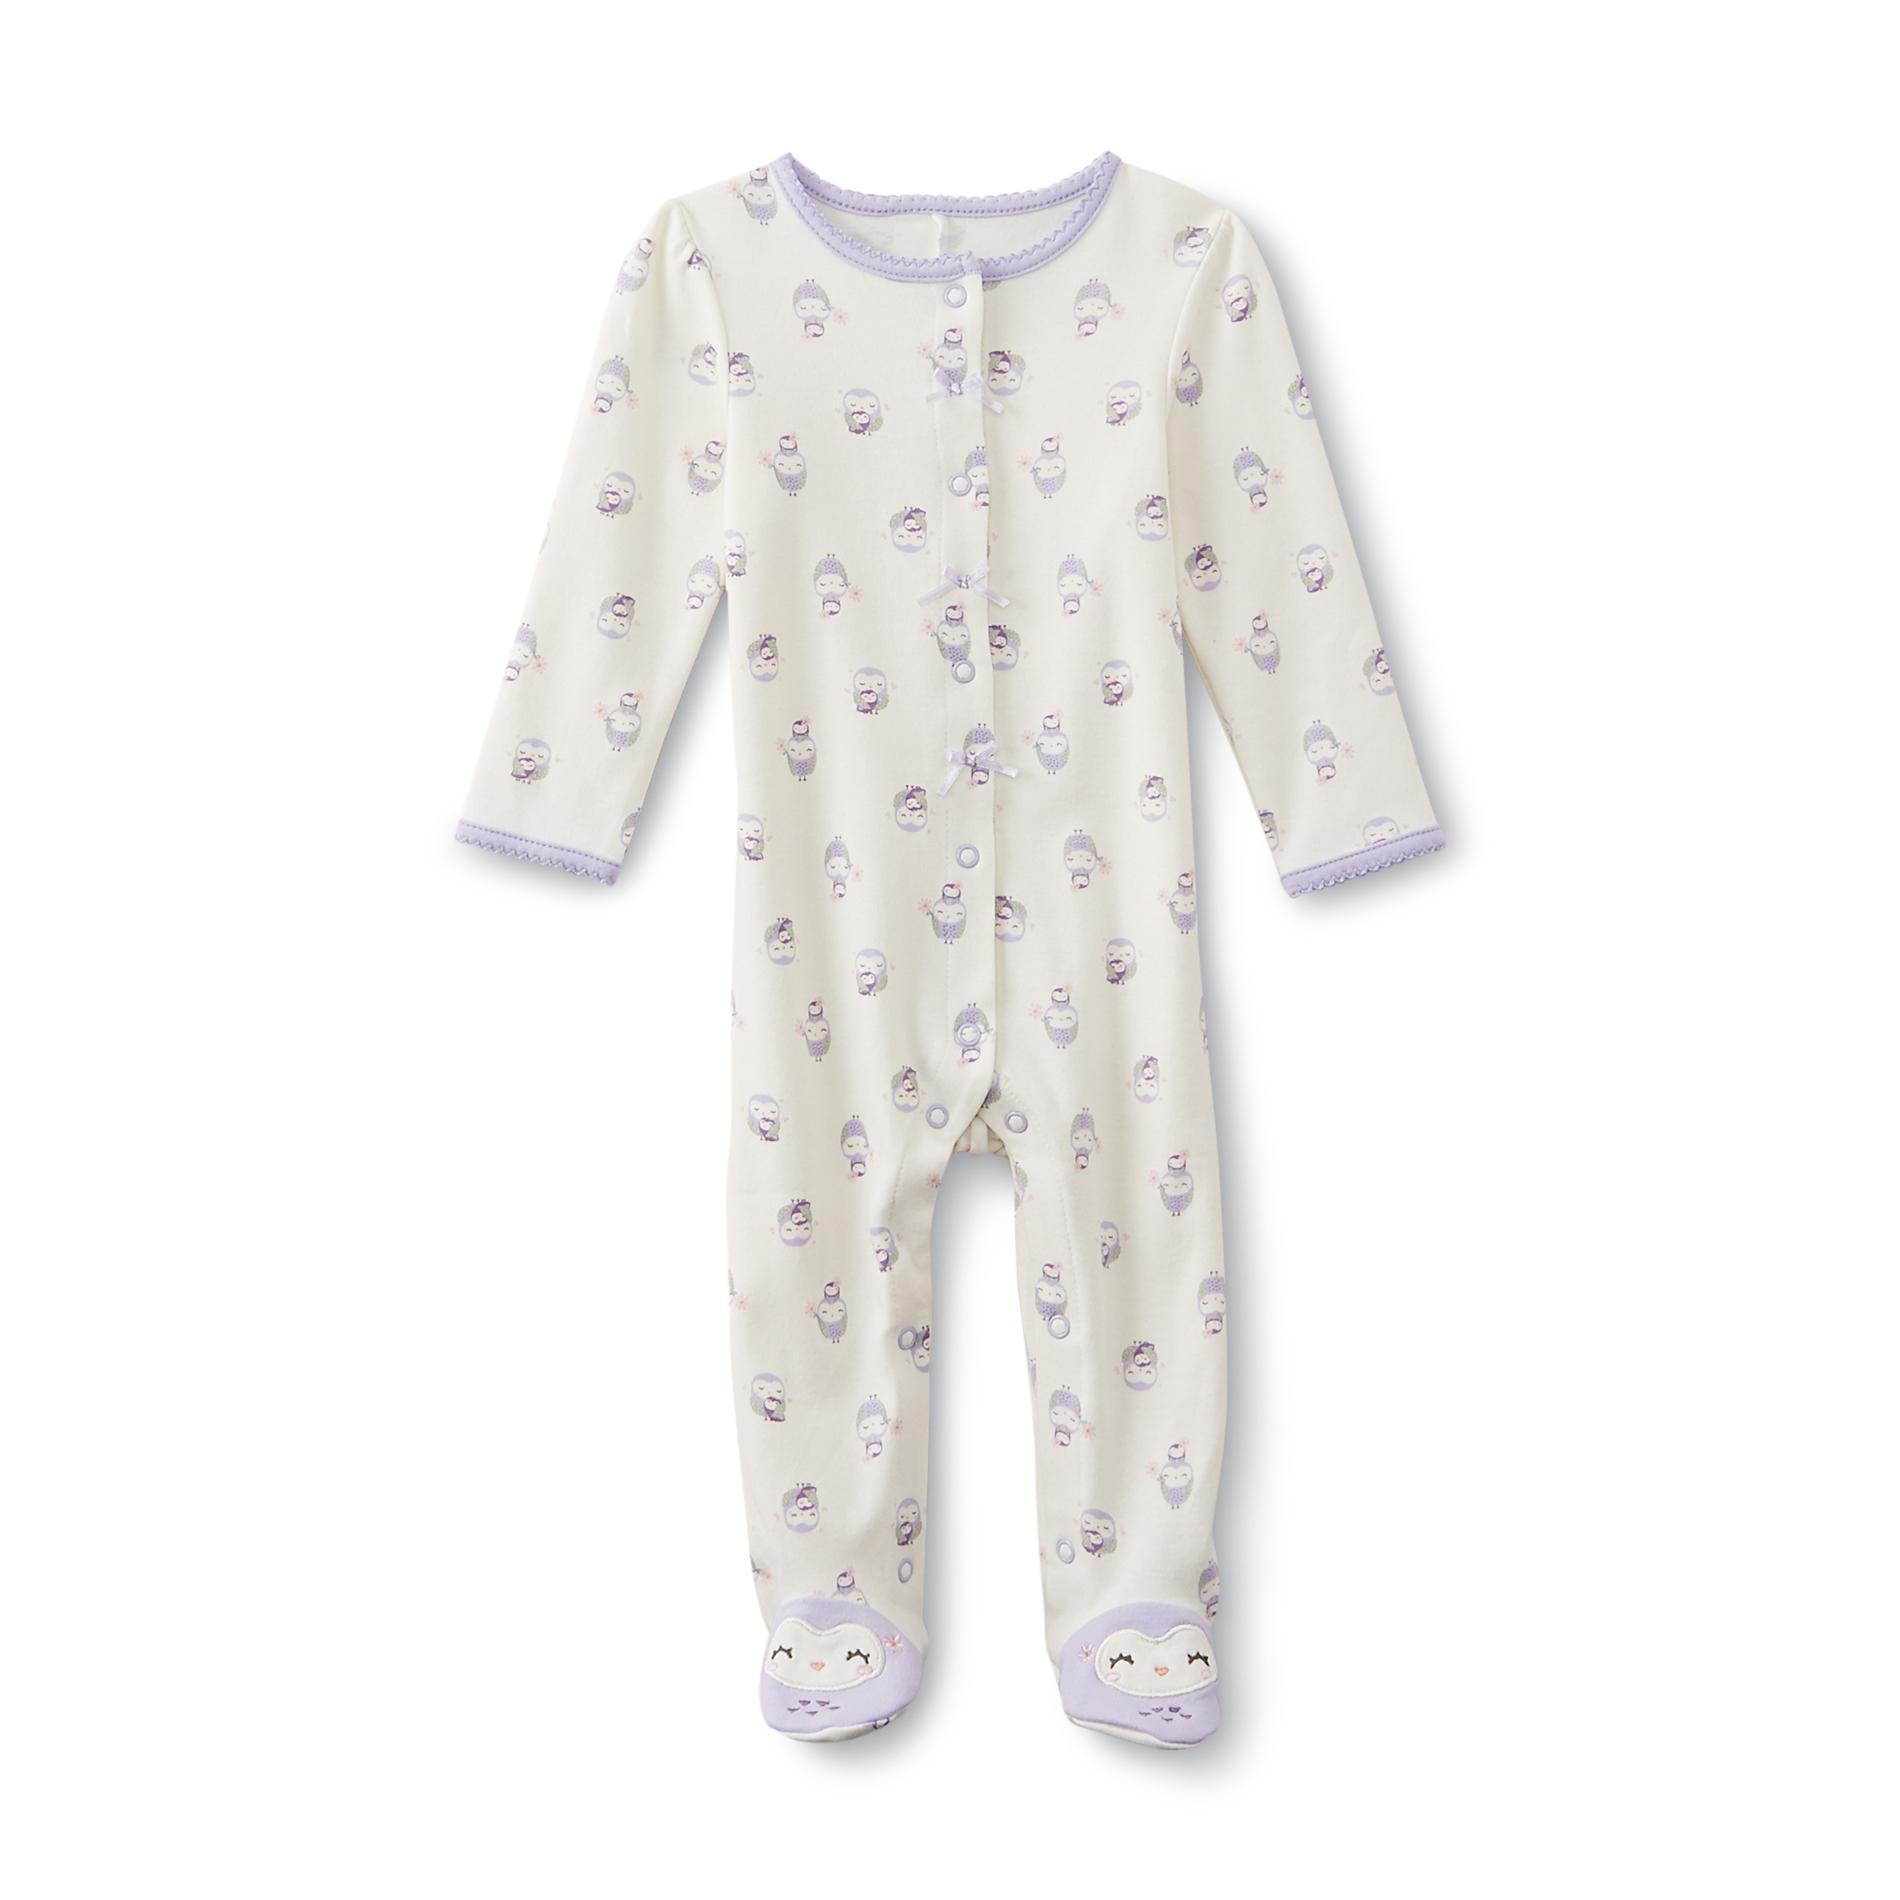 Little Wonders Newborn Girl's Footed Pajamas - Owl